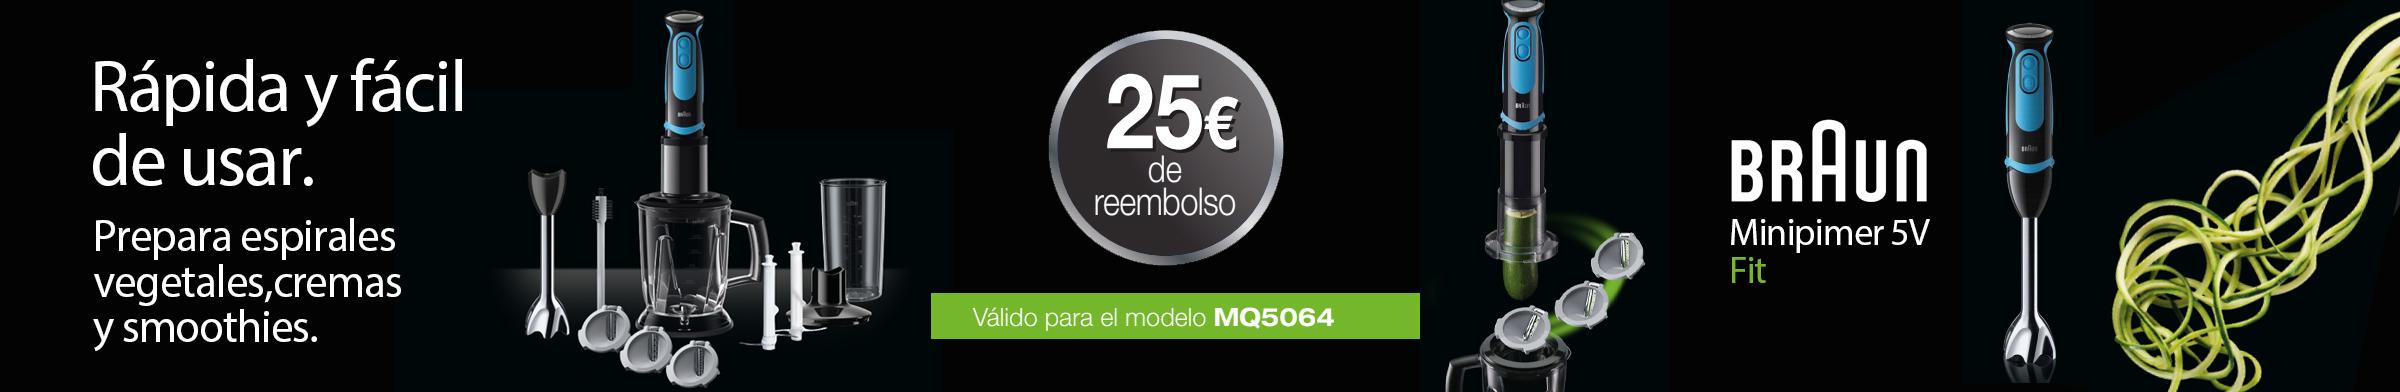 Te devolvemos 25 euros de tu Minipimer 5V FIT